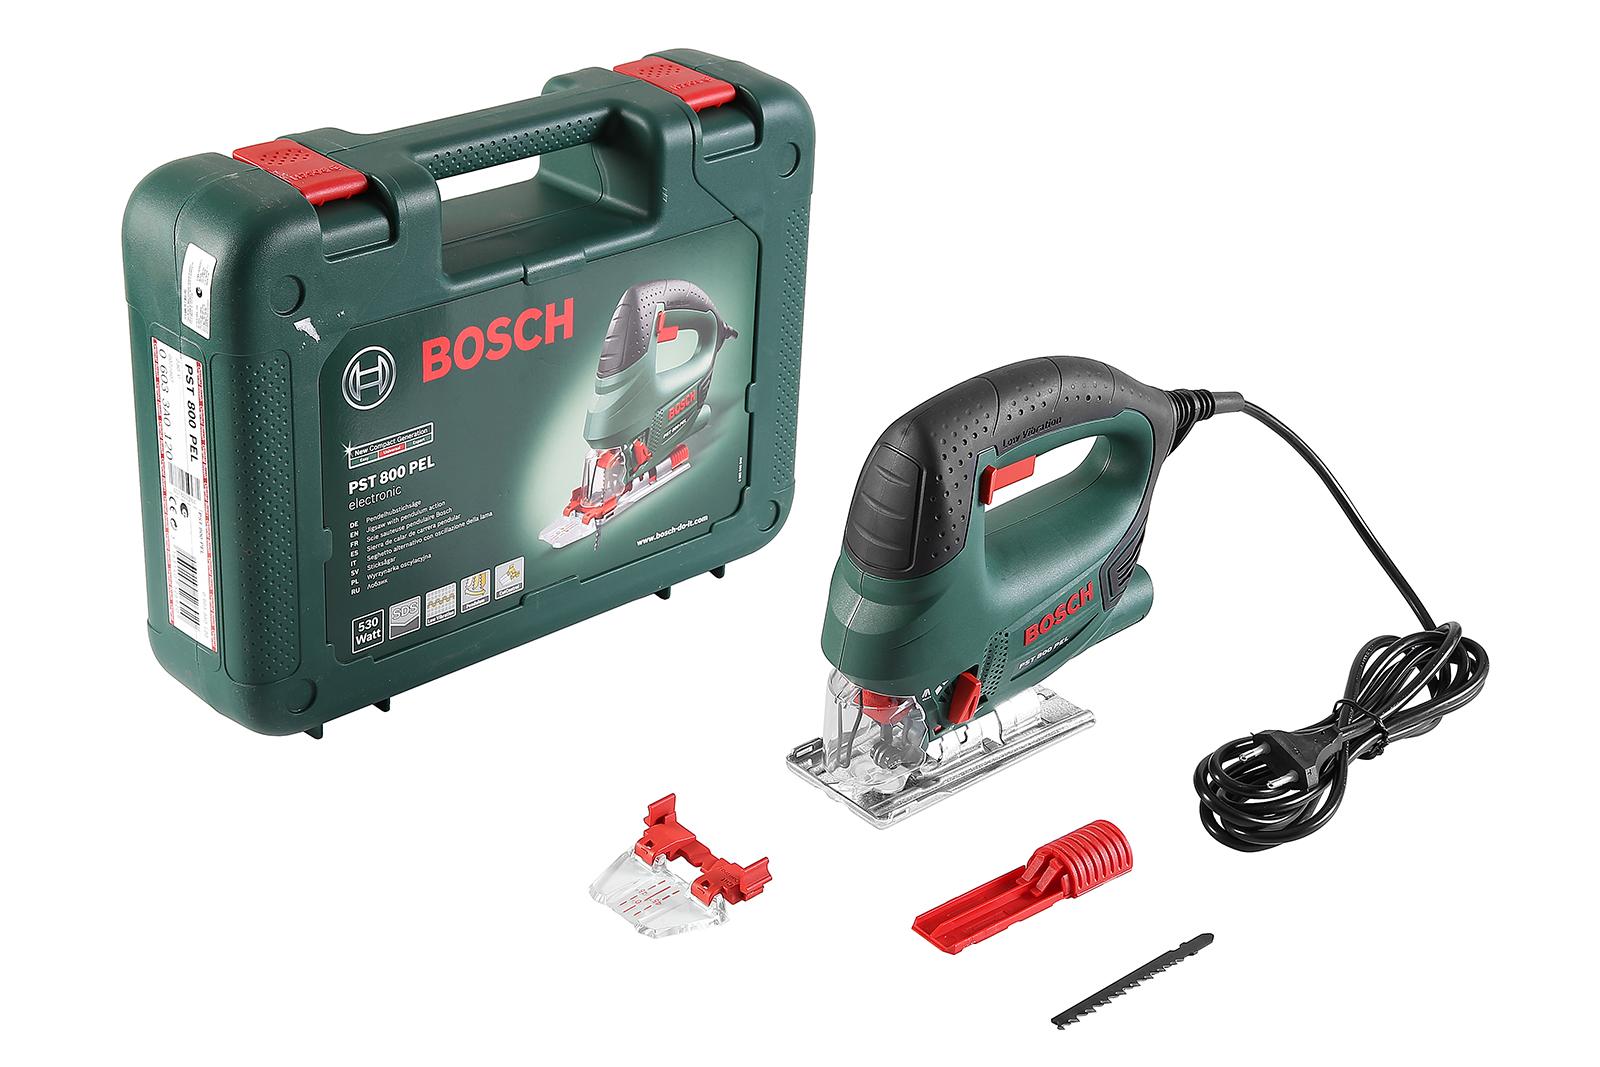 Лобзик Bosch Pst 800 pel compact (0.603.3a0.120)